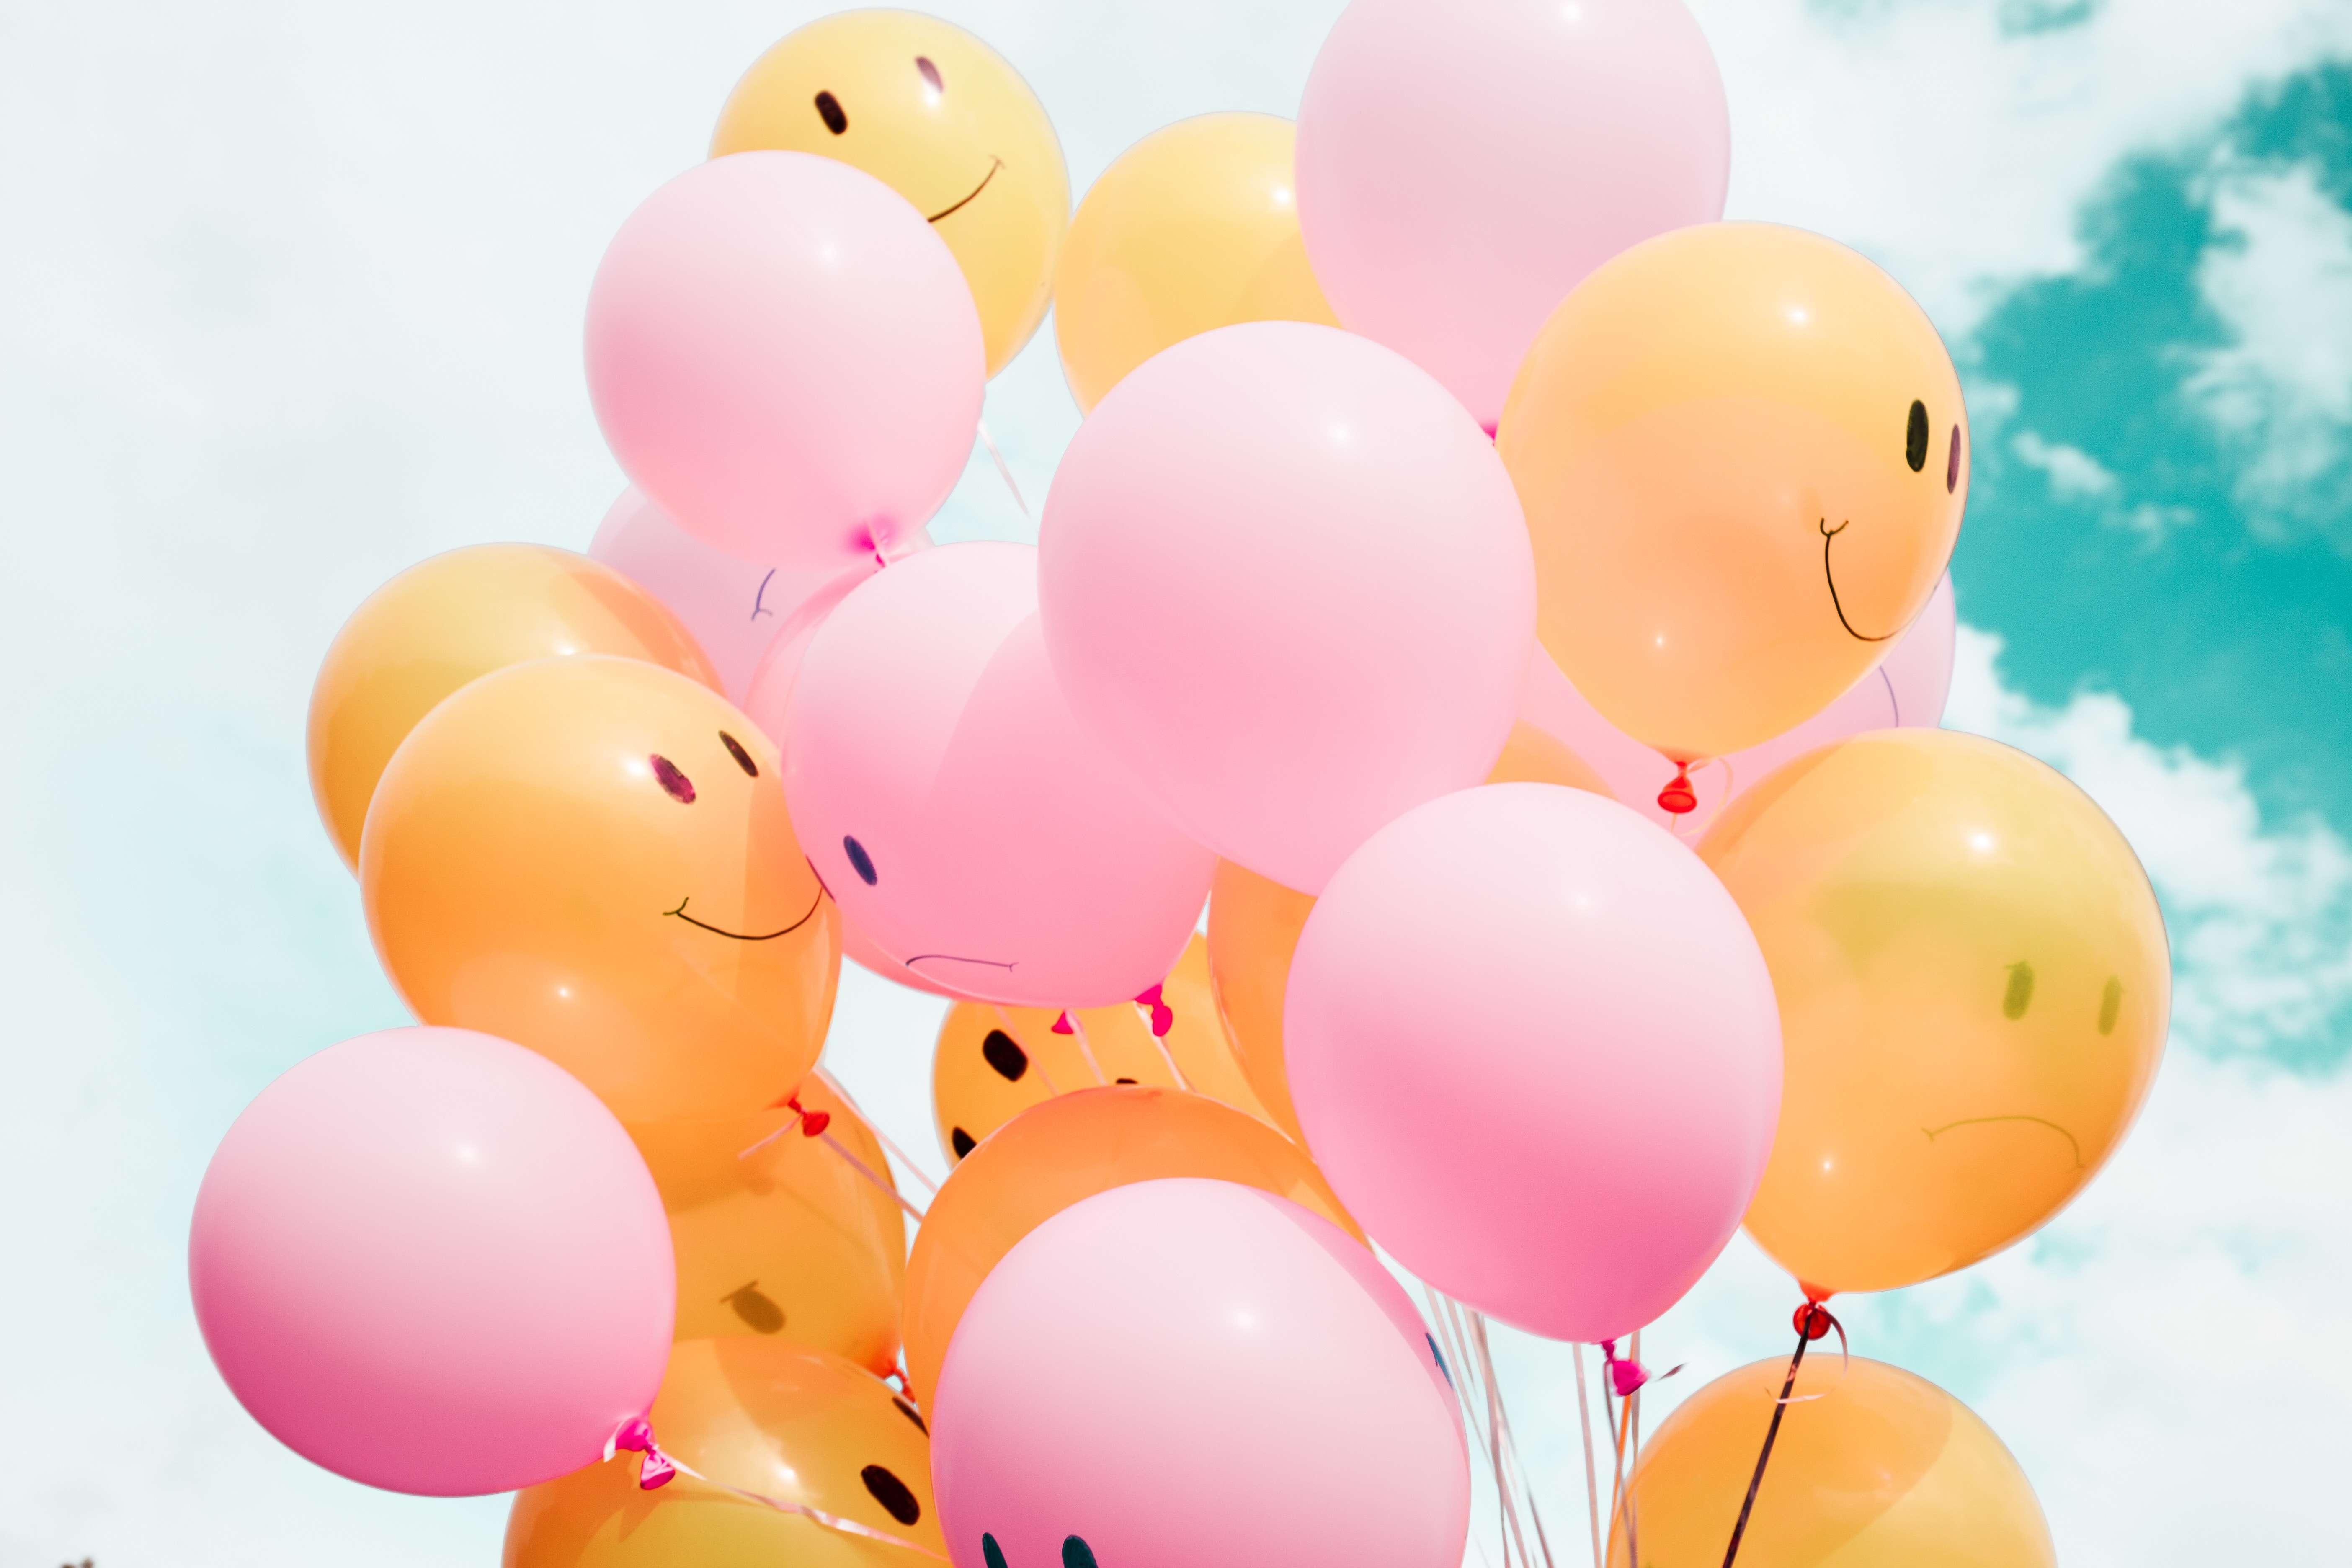 7 Inspiring Ways to Lift Your Spirits Now